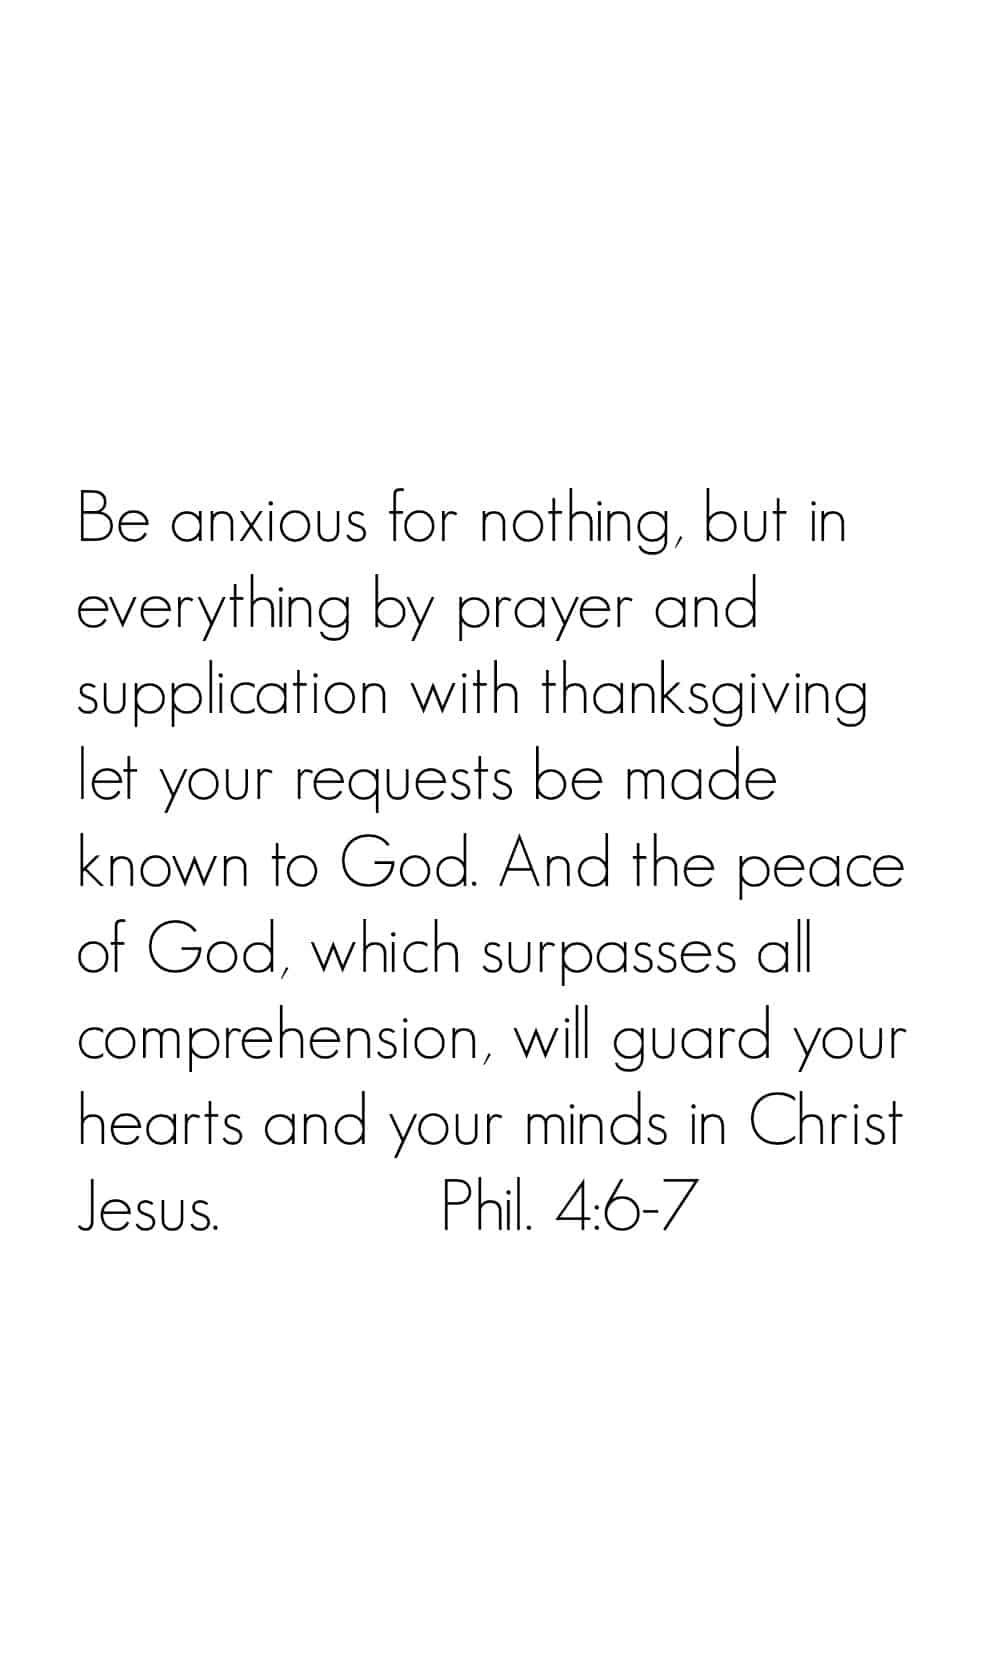 Fall Scripture Iphone Wallpaper Philippians 4 6 7 Bible Verse Iphone Wallpaper